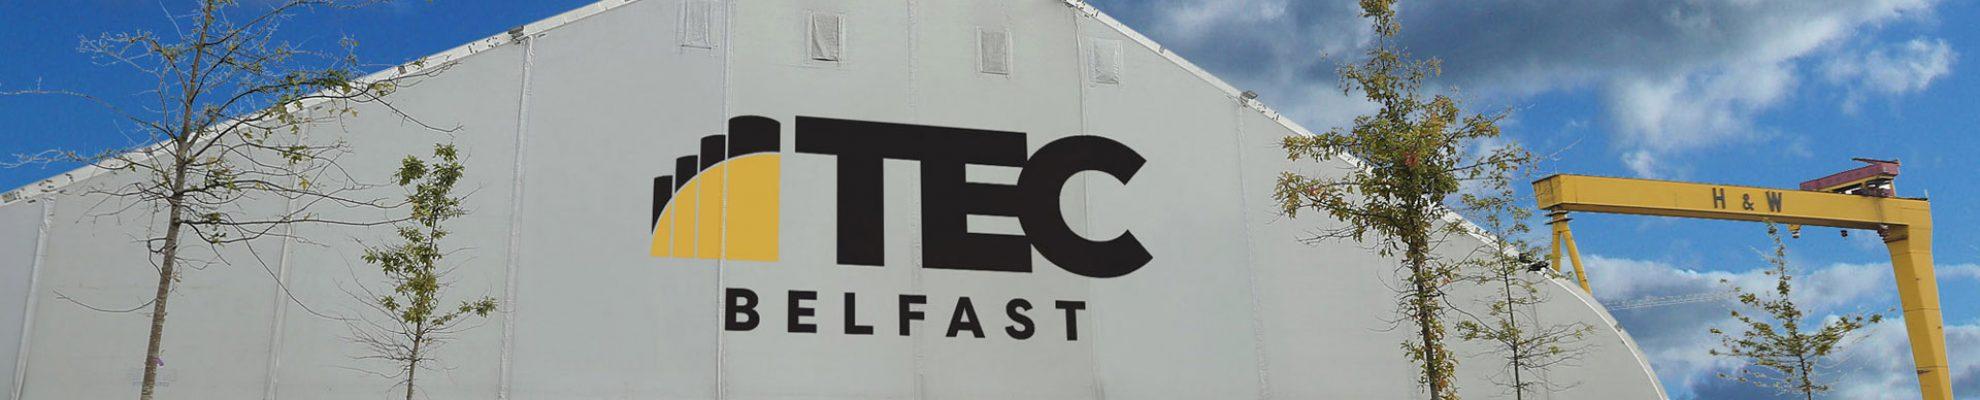 TECLogo-Building.jpg_1557908190